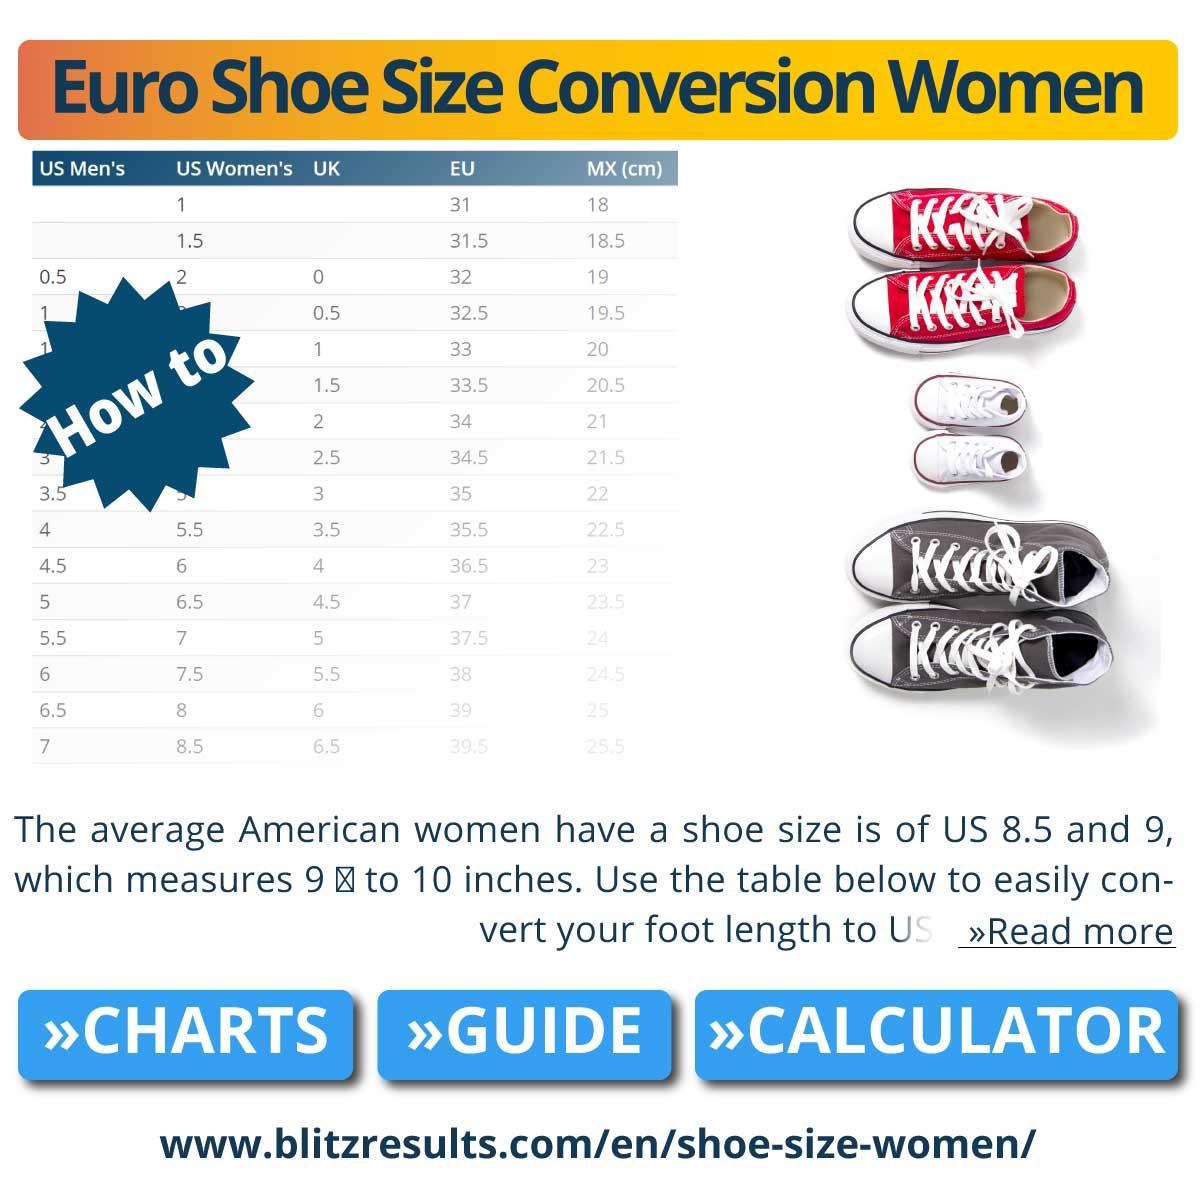 Euro Shoe Size Conversion Women